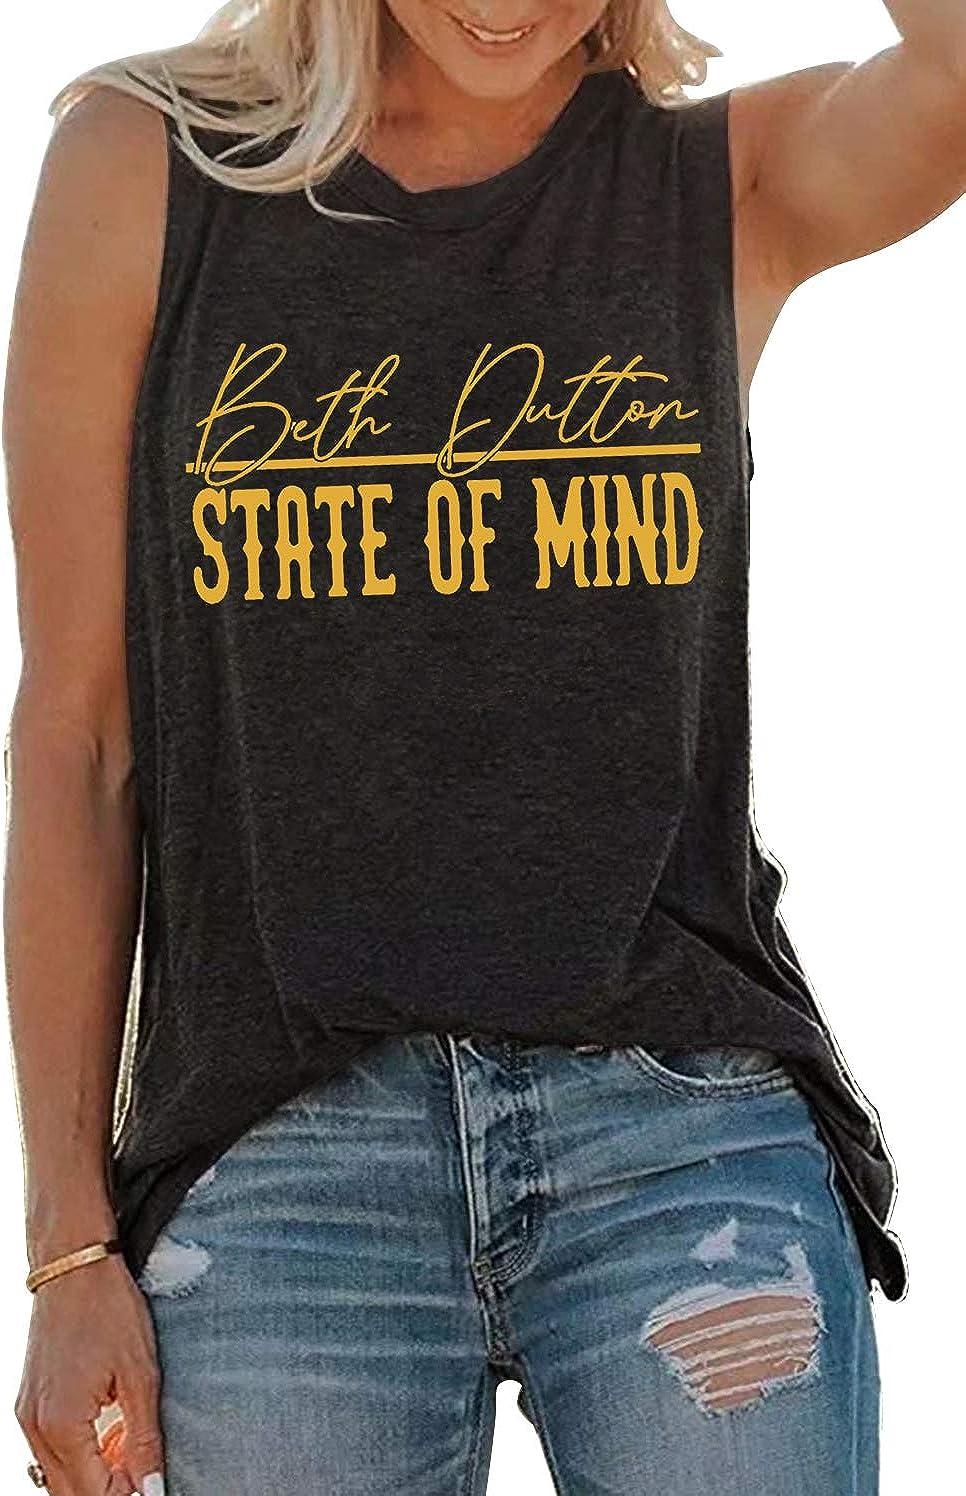 Beth Dutton San Antonio Mall Dedication Tank Tops for Women Vintage Casual Musc Funny Summer